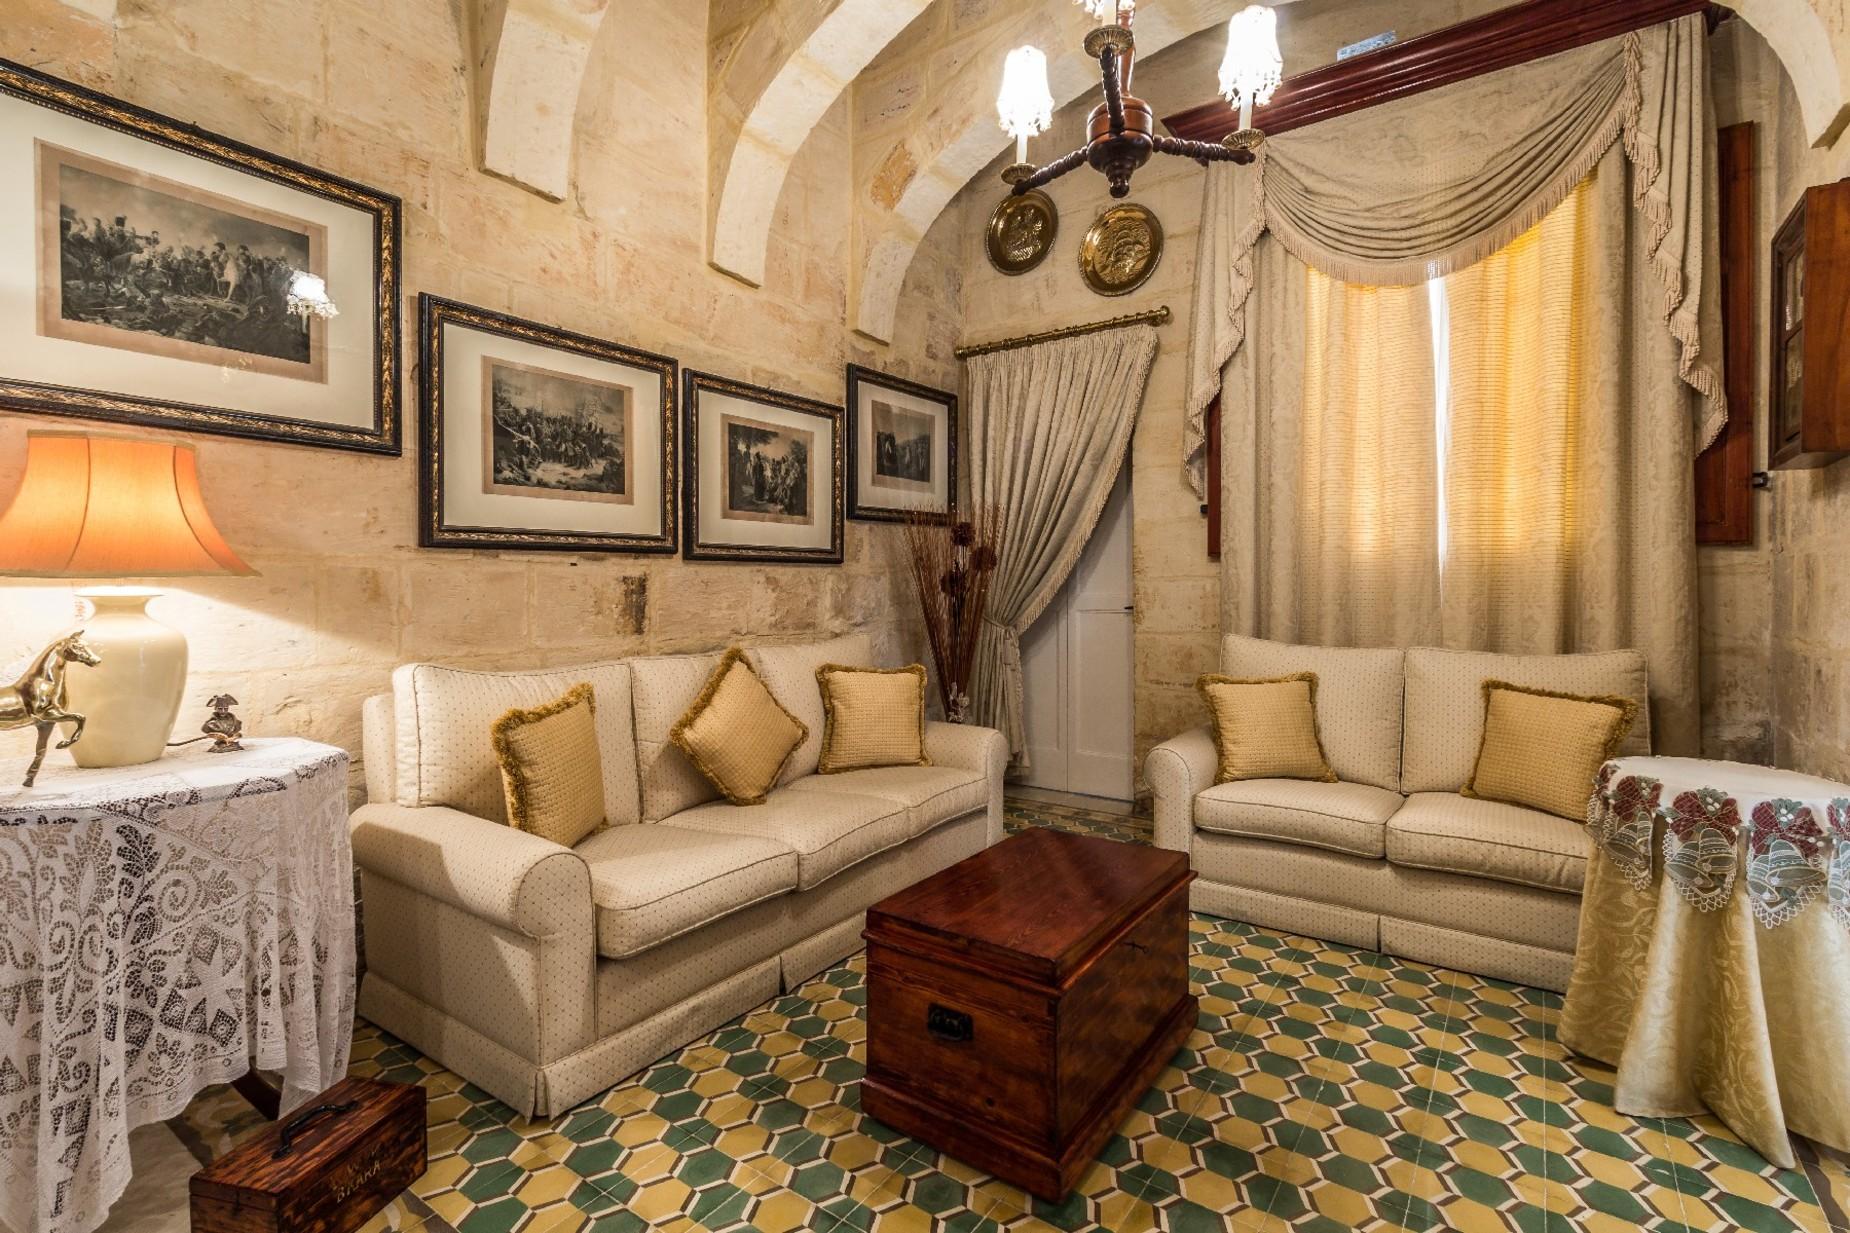 4 bed Town House For Sale in Birkirkara, Birkirkara - thumb 2